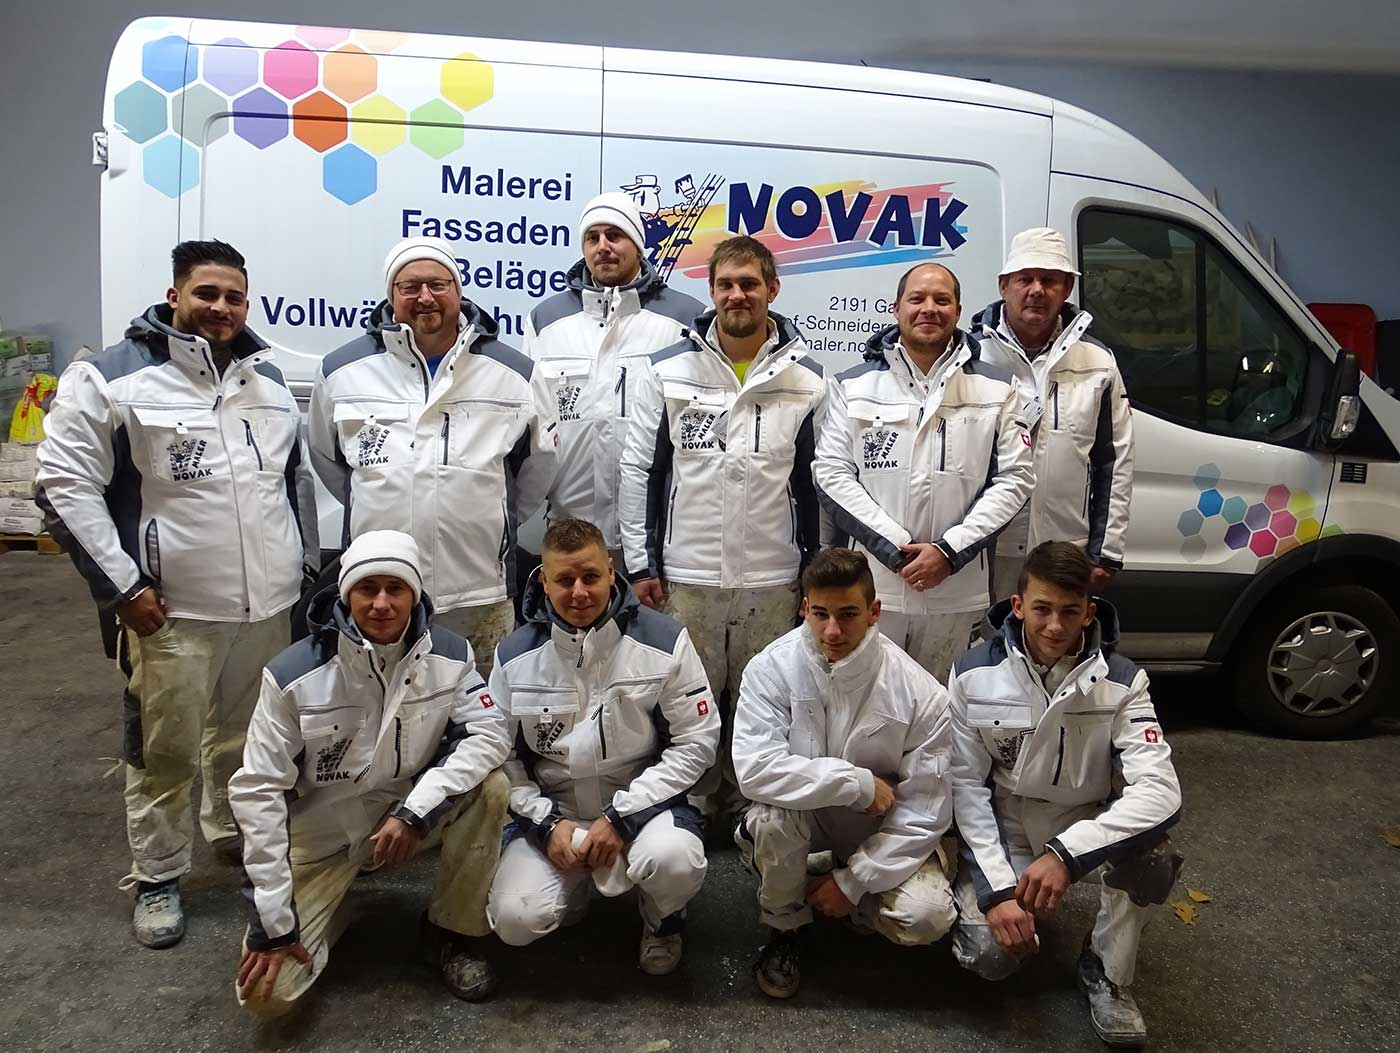 Malerbetrieb Novak Wien